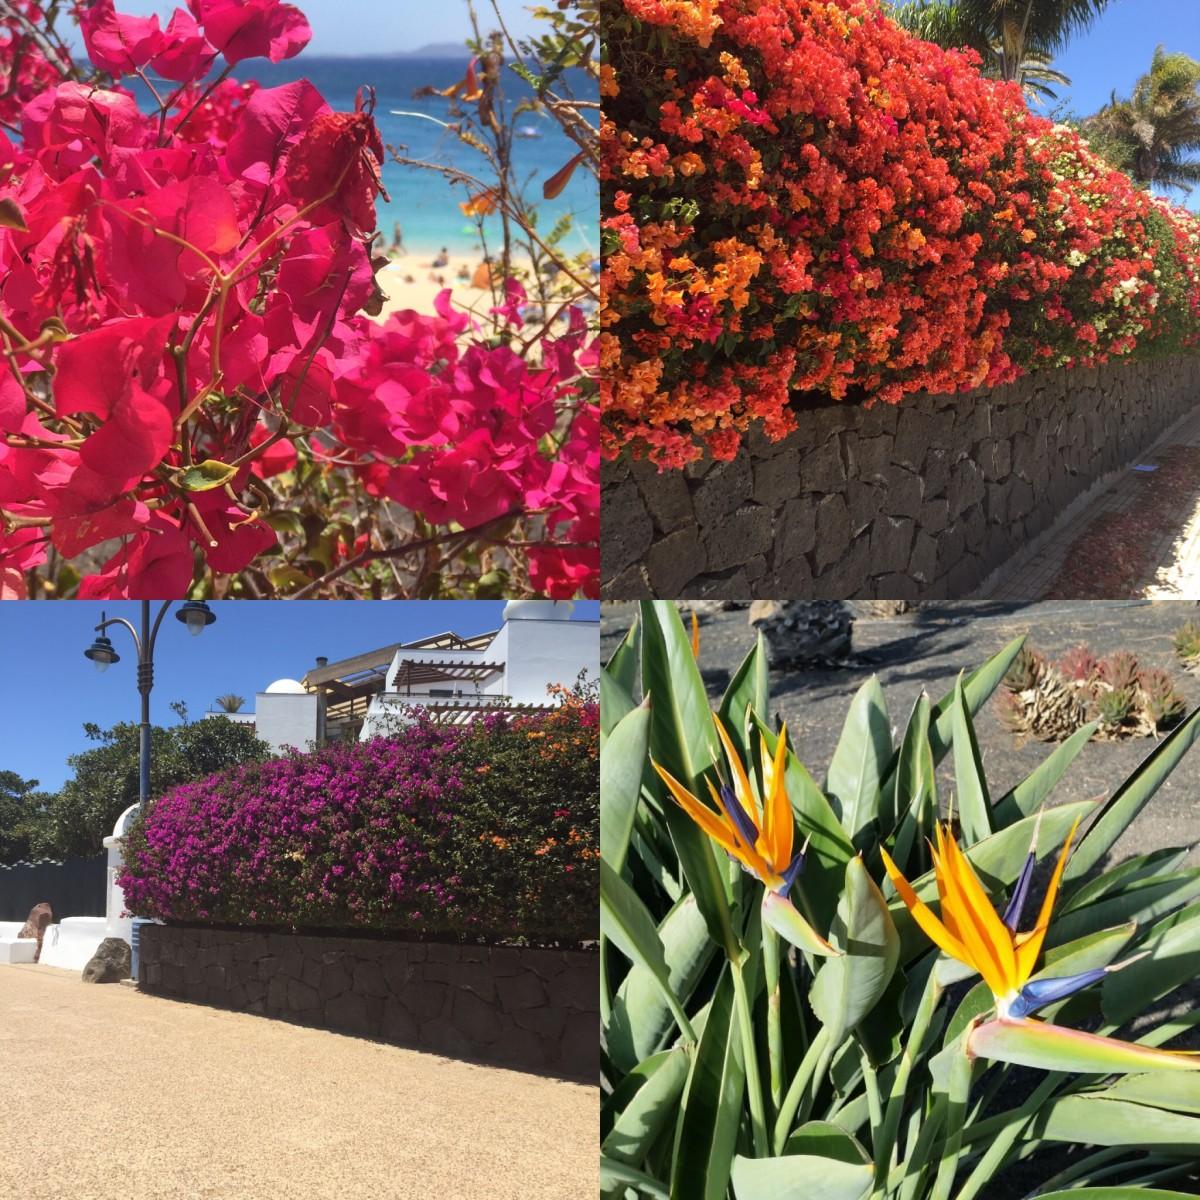 Feral Cats Of Playa Blanca, Lanzarote, Part Three